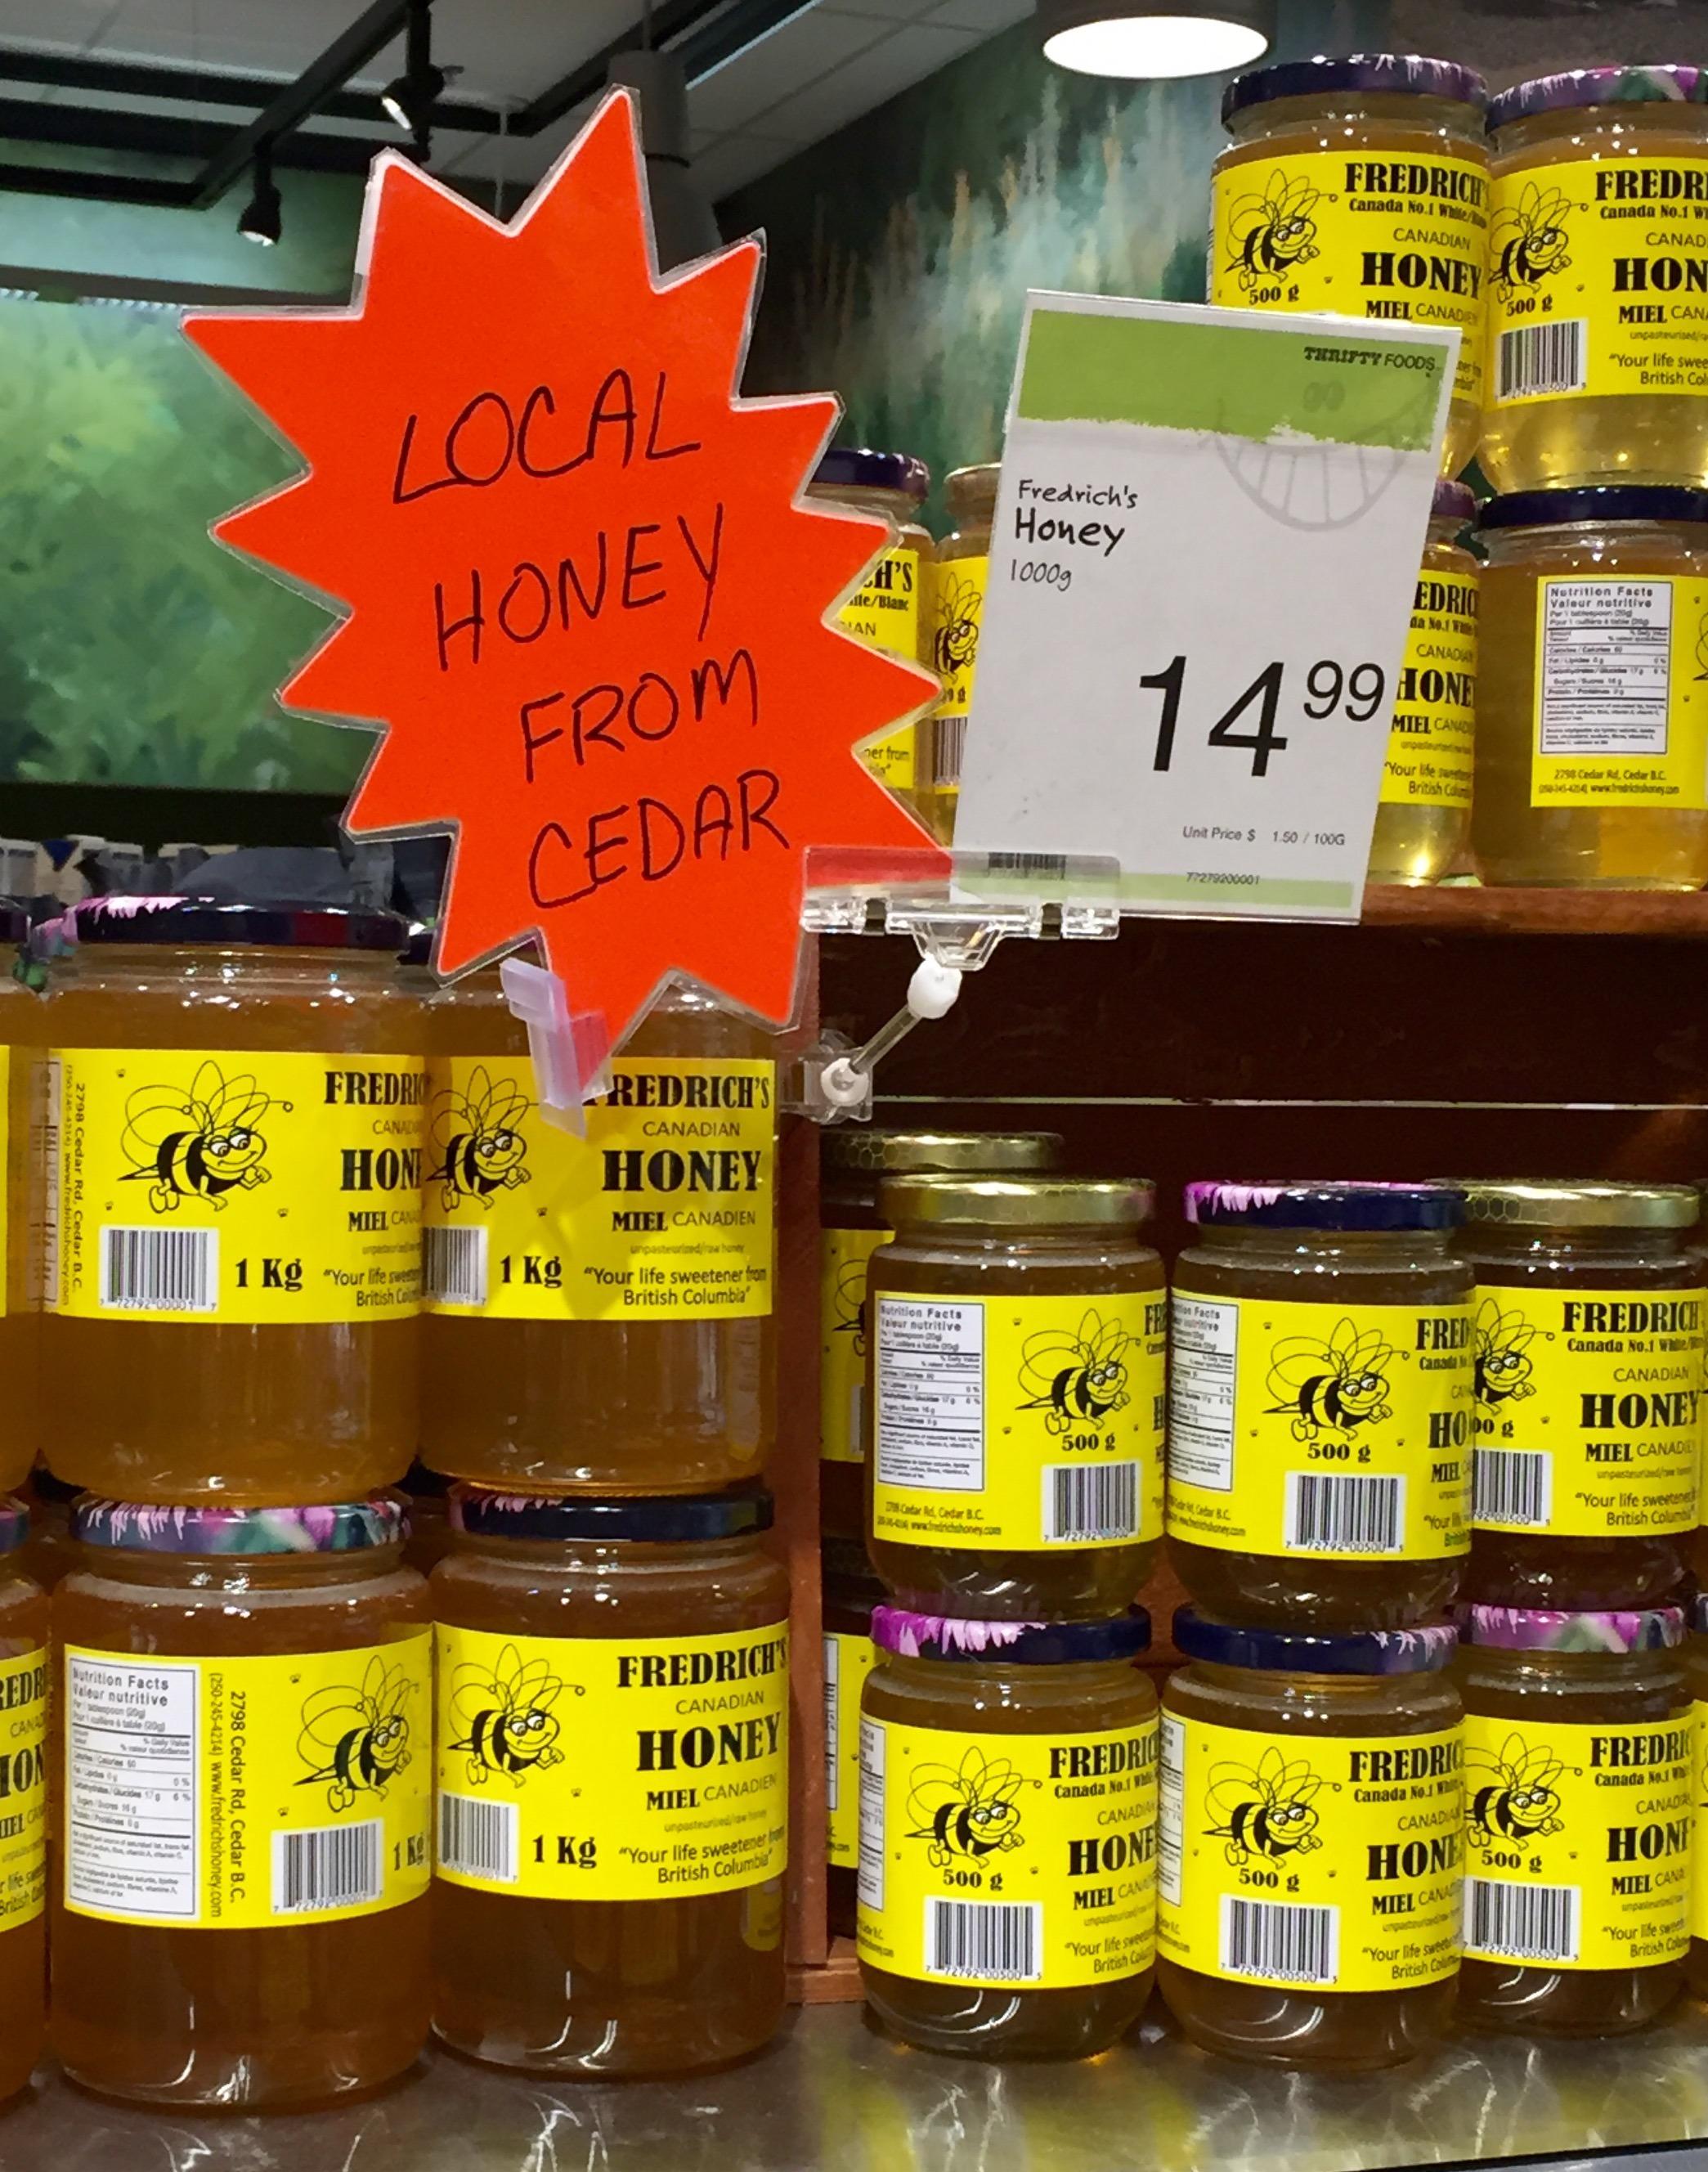 Fredrich's Honey